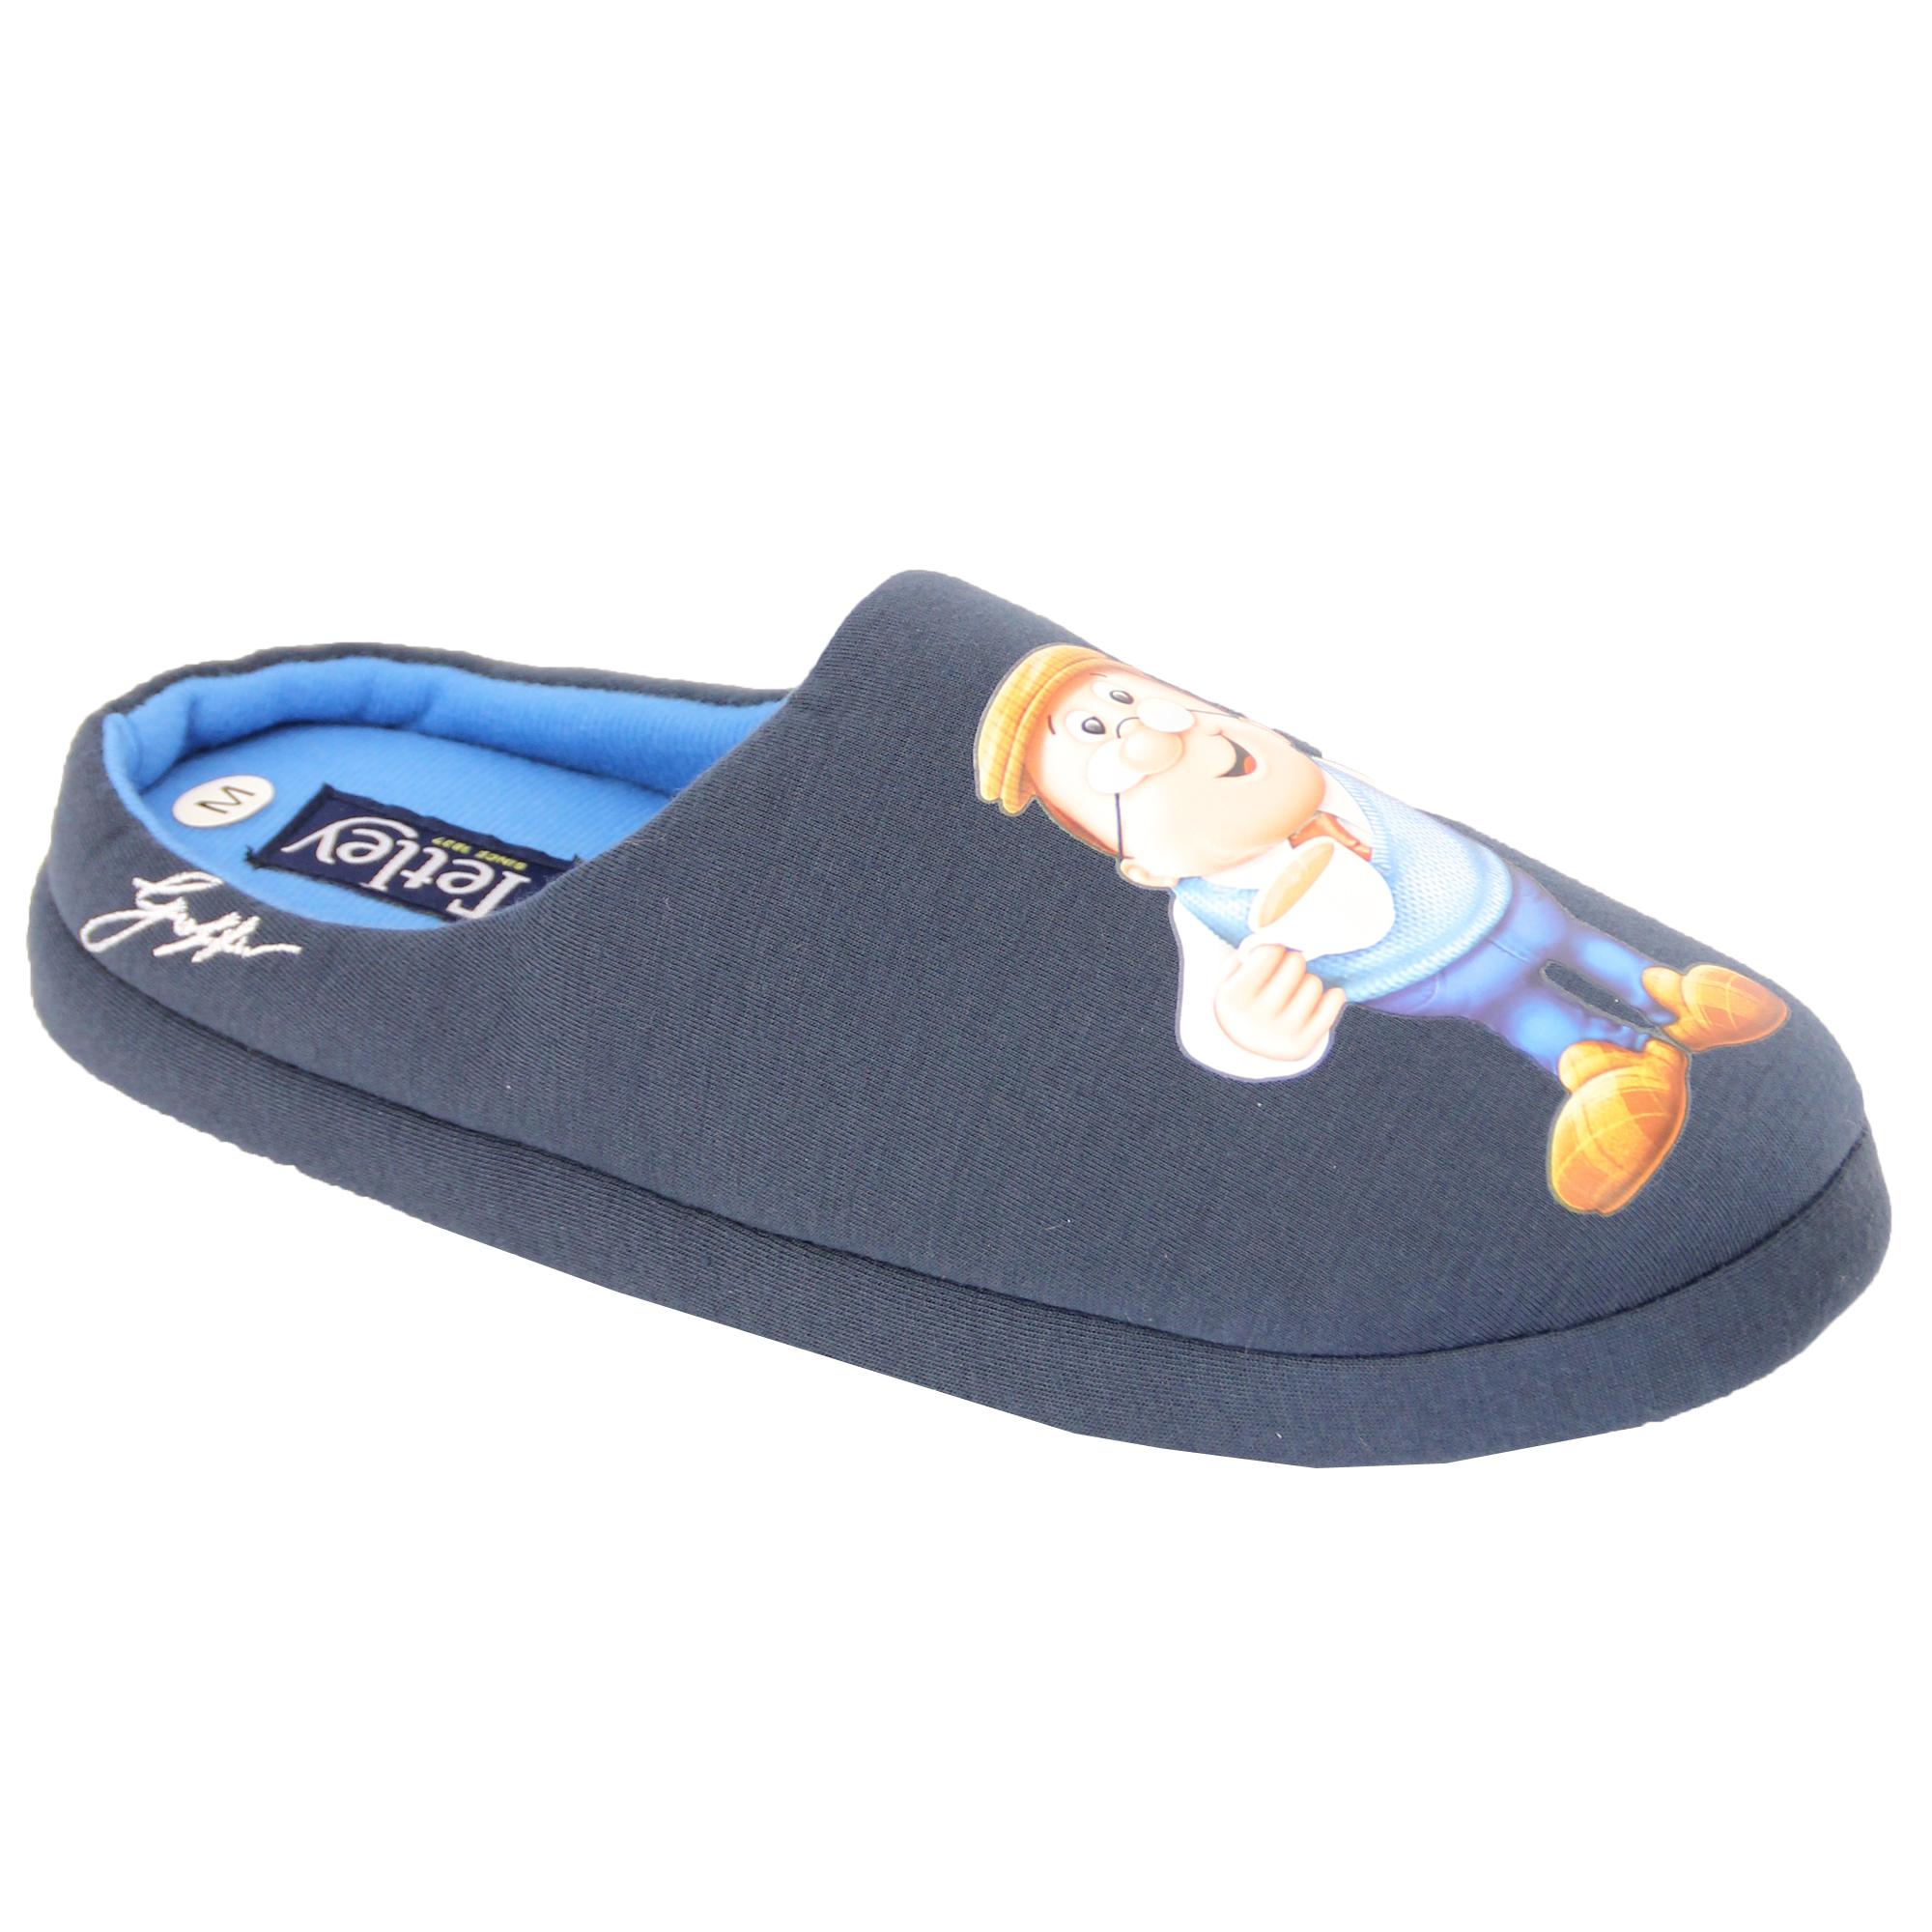 Pantofole-Uomo-Homer-Simpsons-Minion-Star-Wars-Tetley-Mule-Sandali-Novita-DUFF